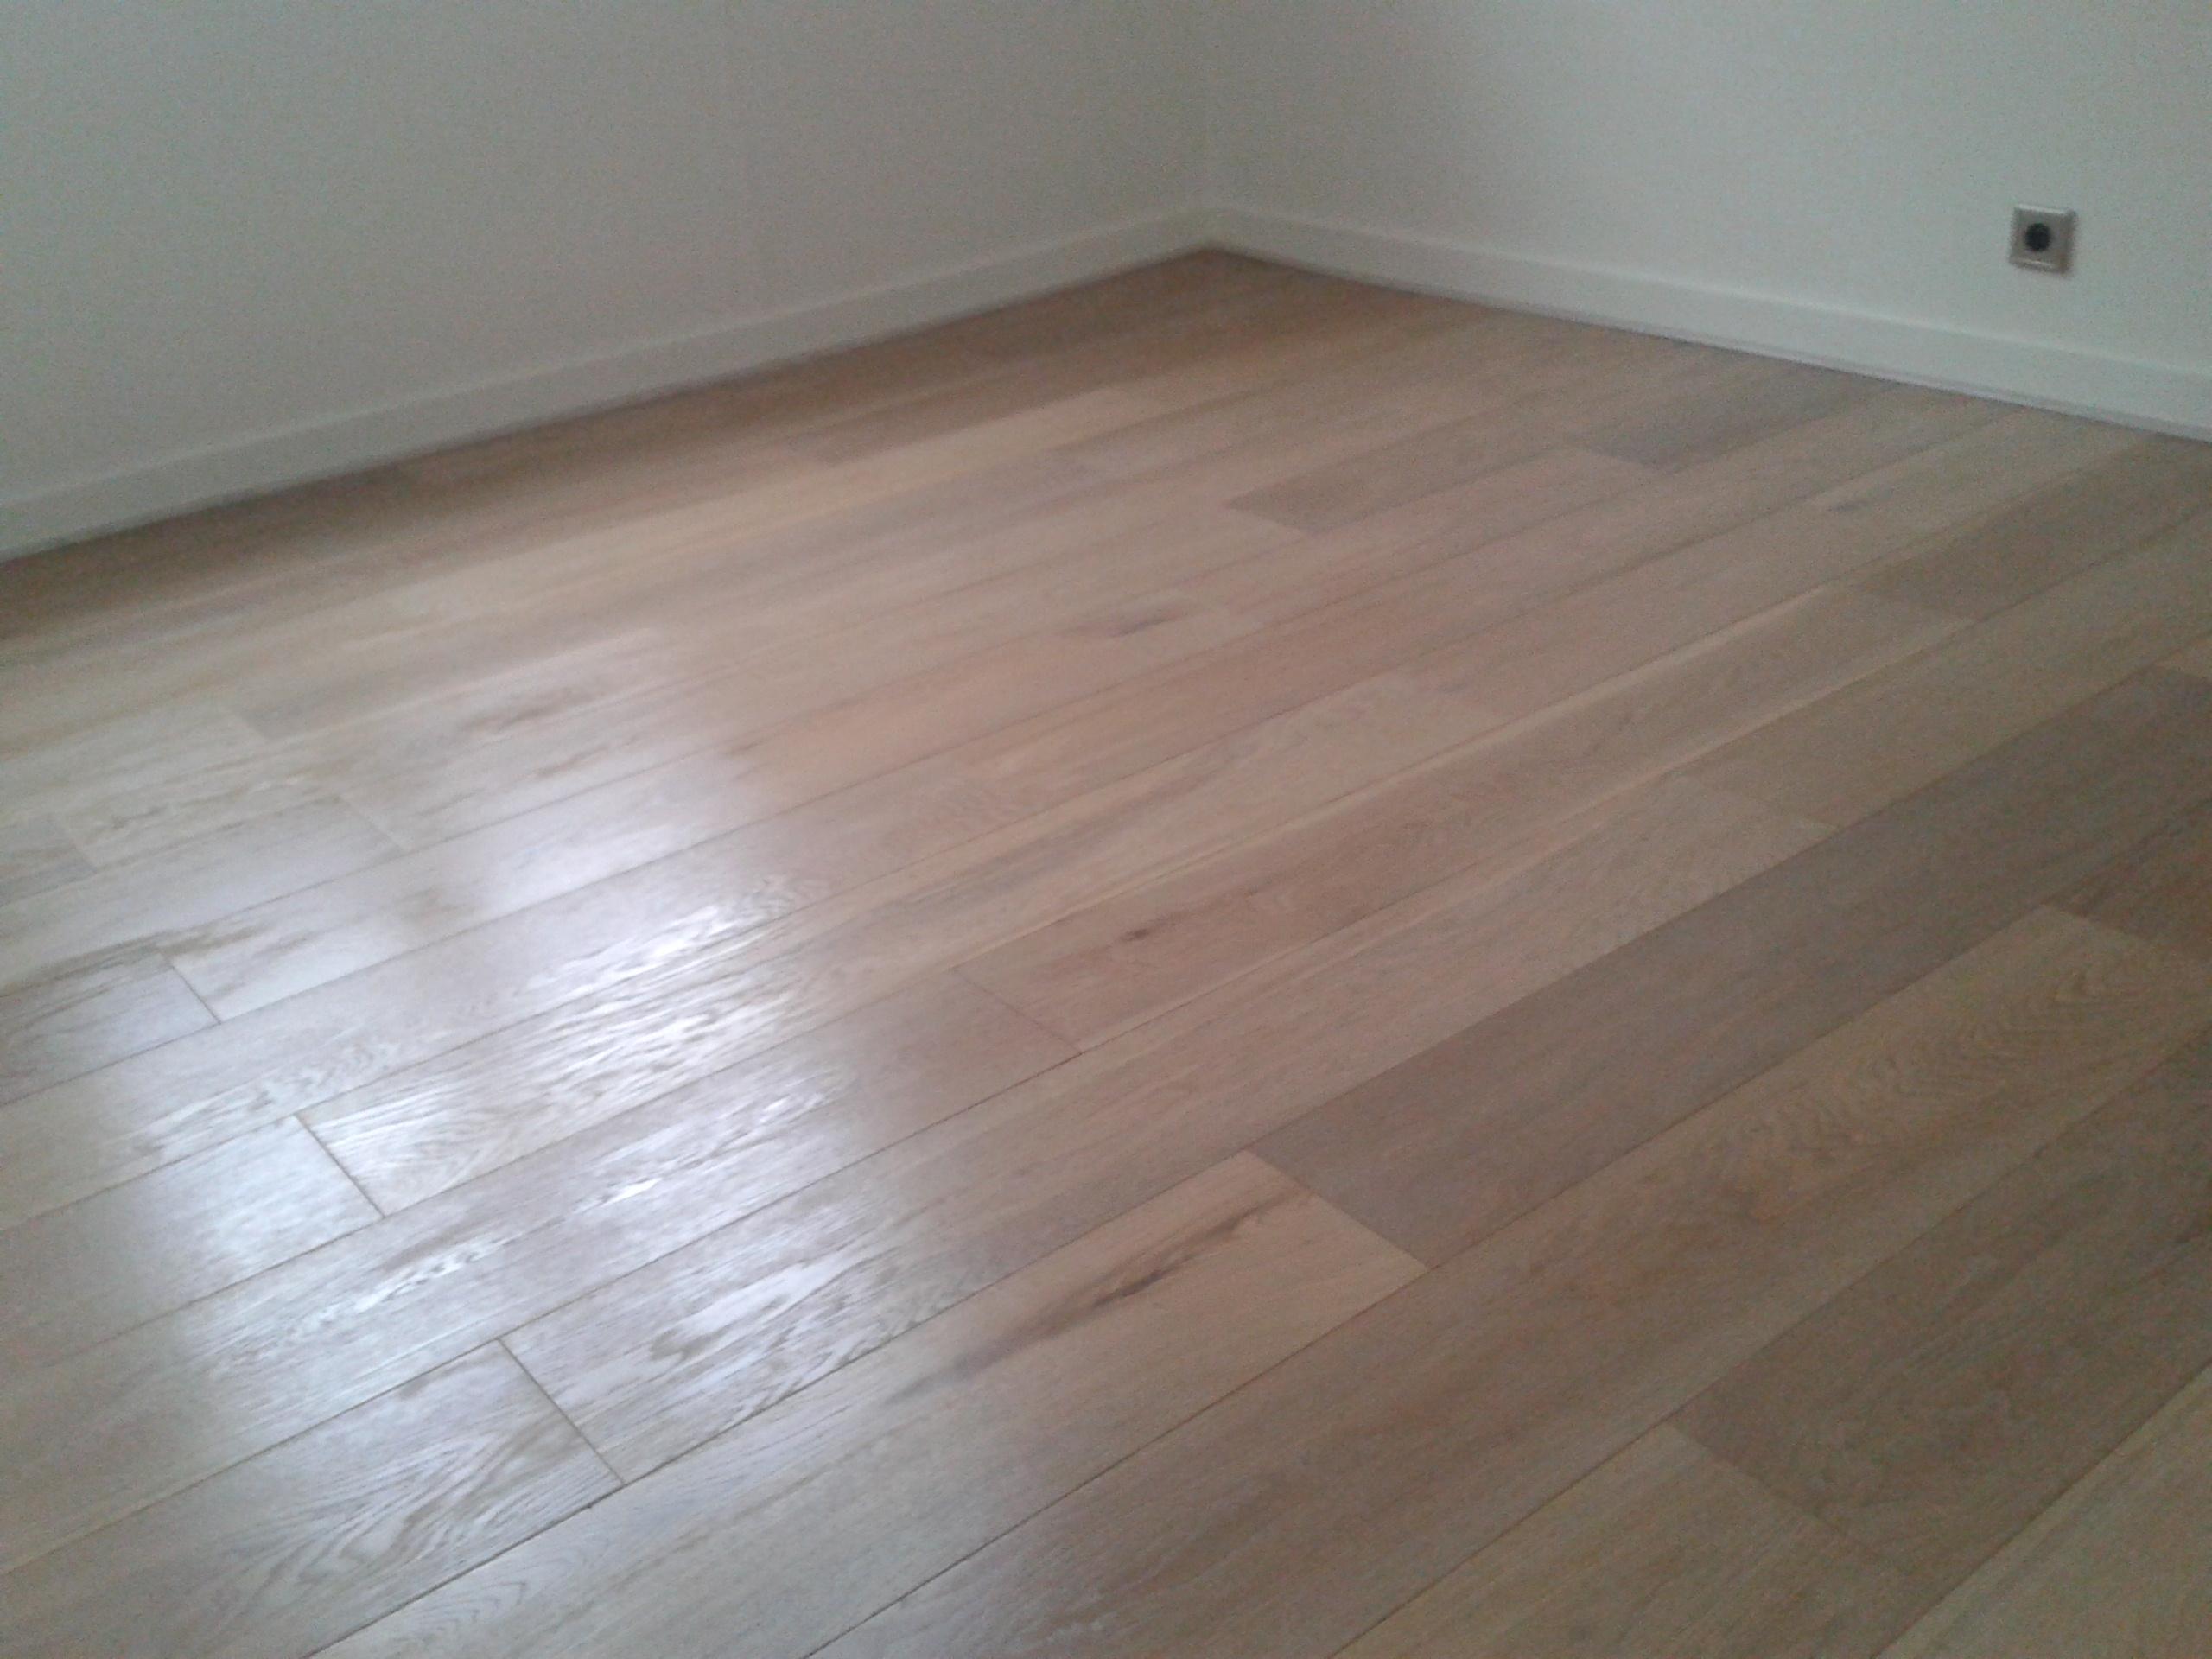 schoettel peinture. Black Bedroom Furniture Sets. Home Design Ideas